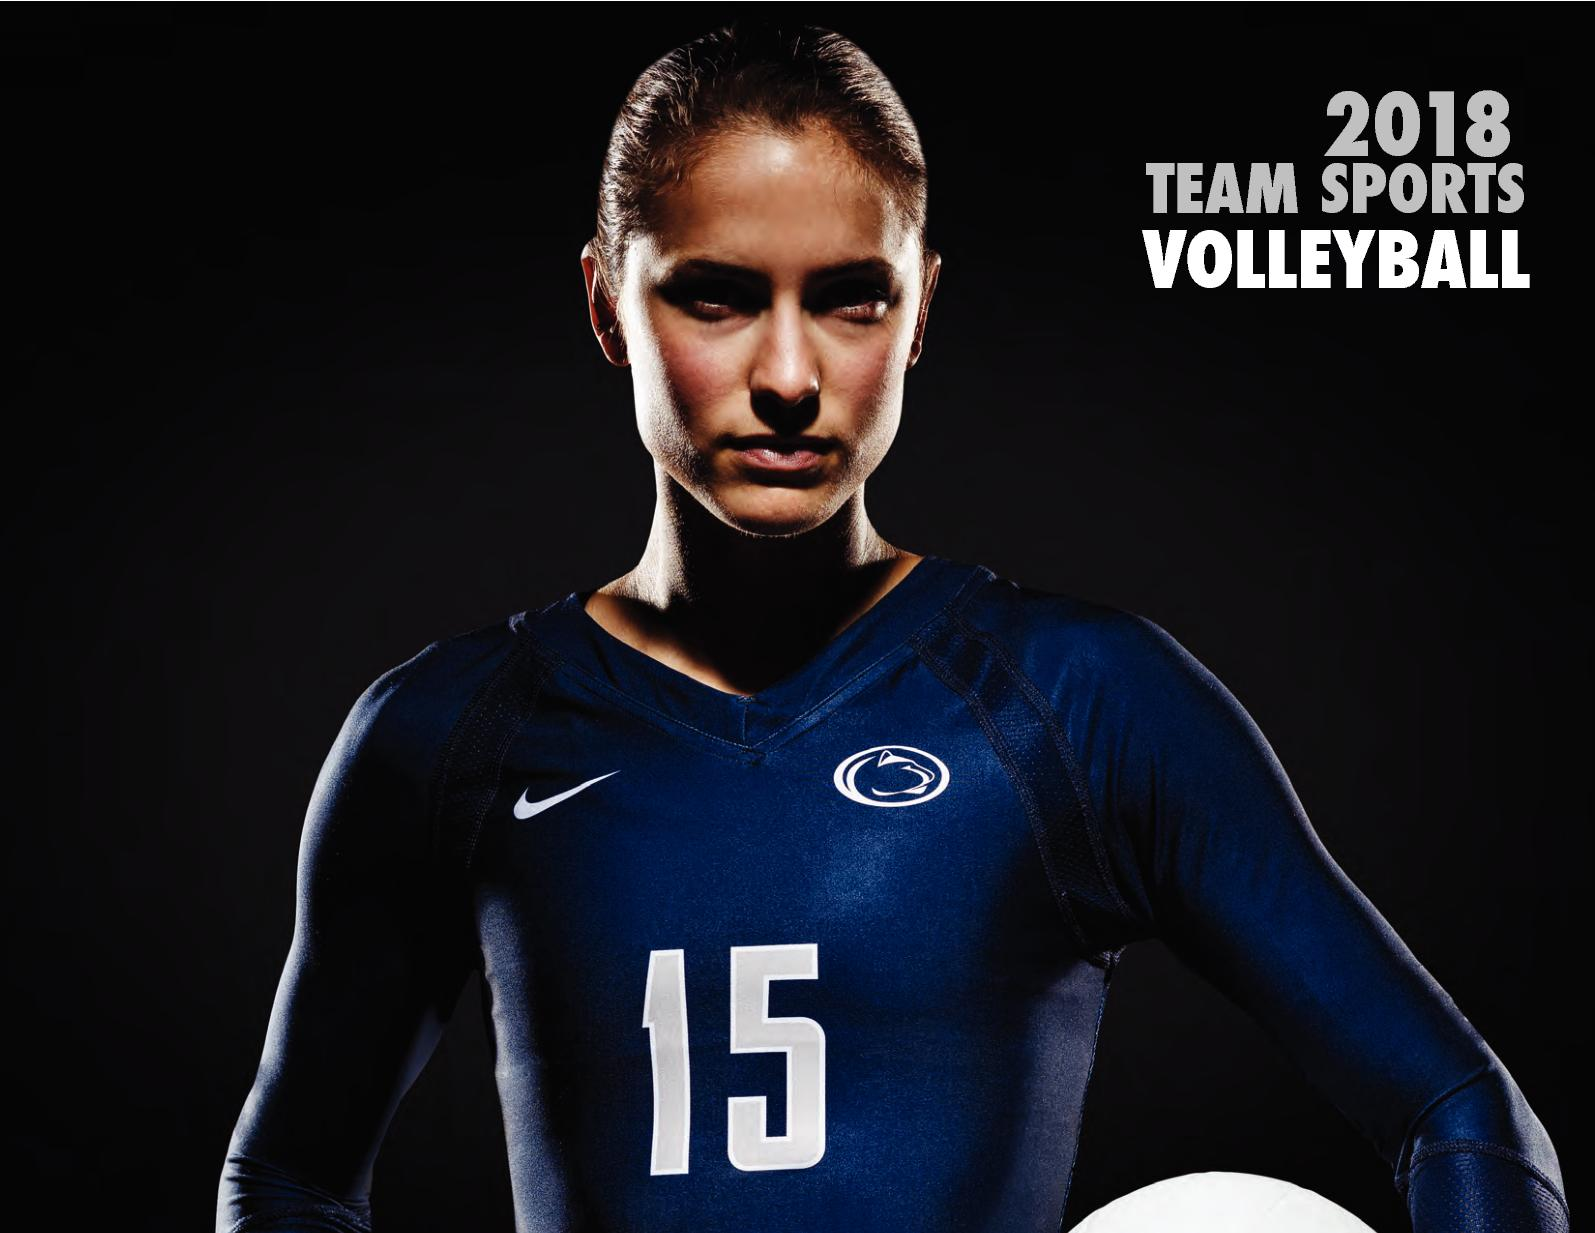 ab8efa734e20 Calaméo - Nike Team Volleyball